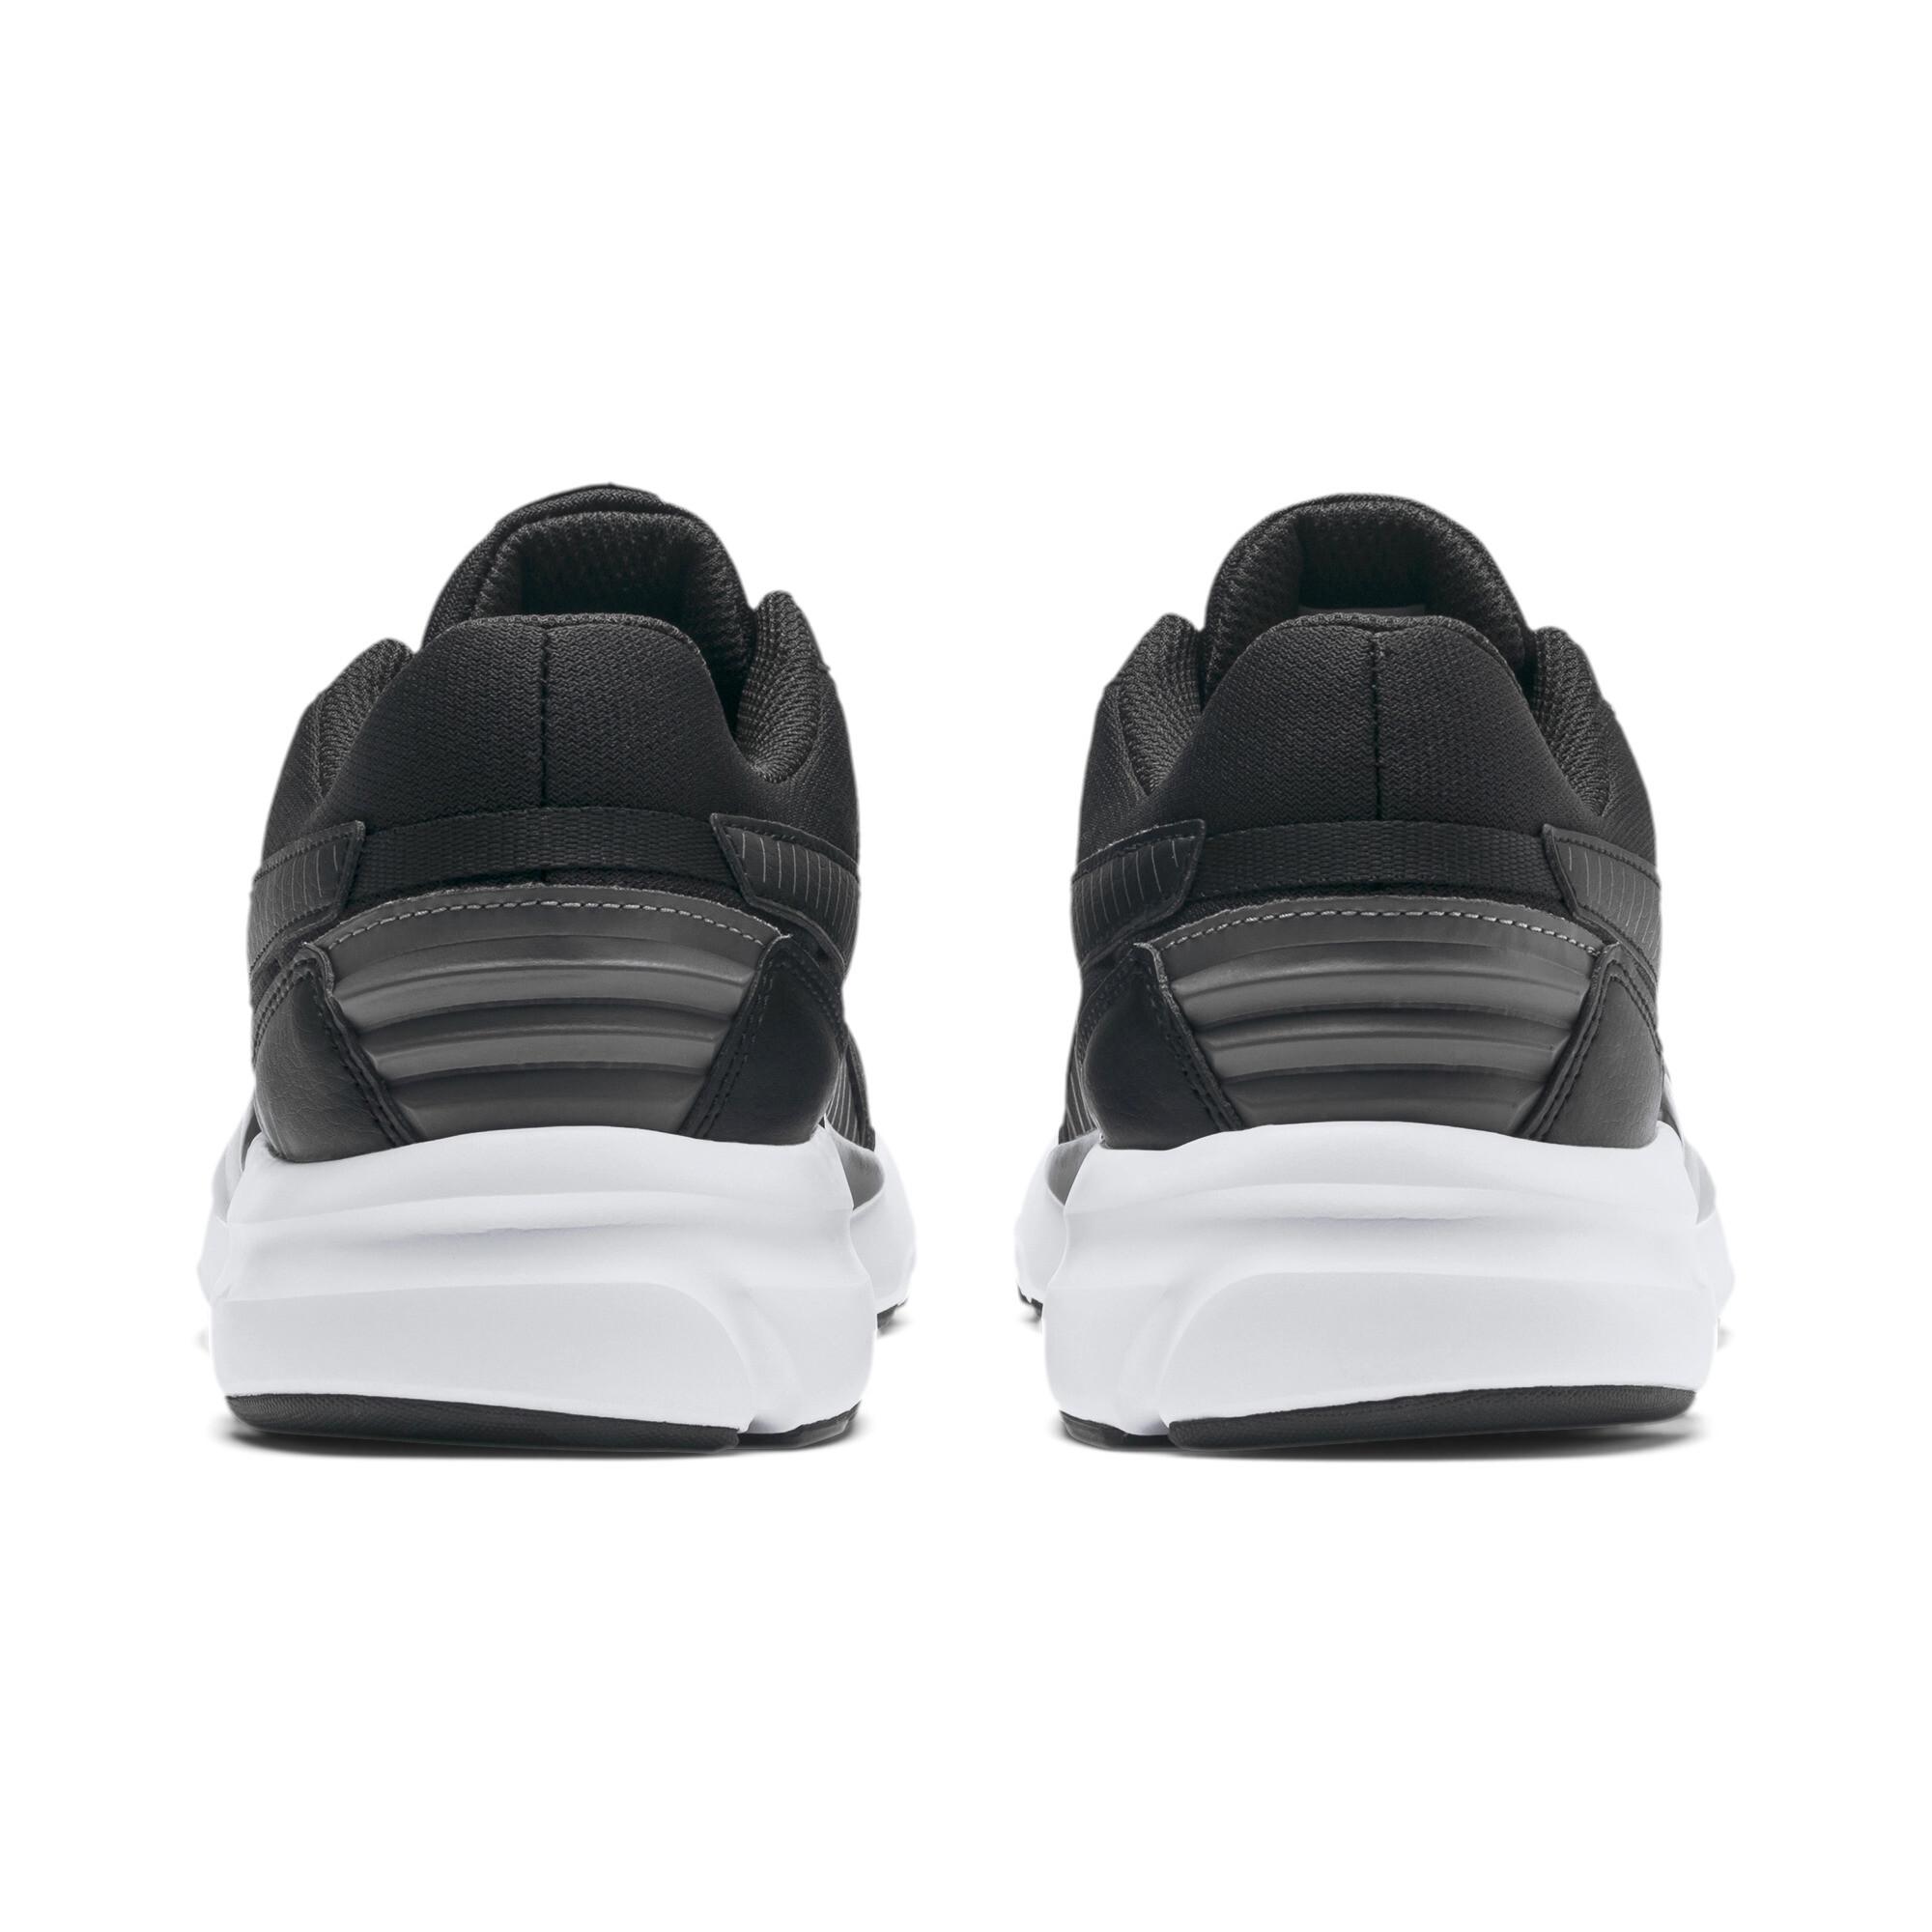 PUMA-Future-Runner-SL-Sneaker-Unisex-Schuhe-Basics-Neu Indexbild 11